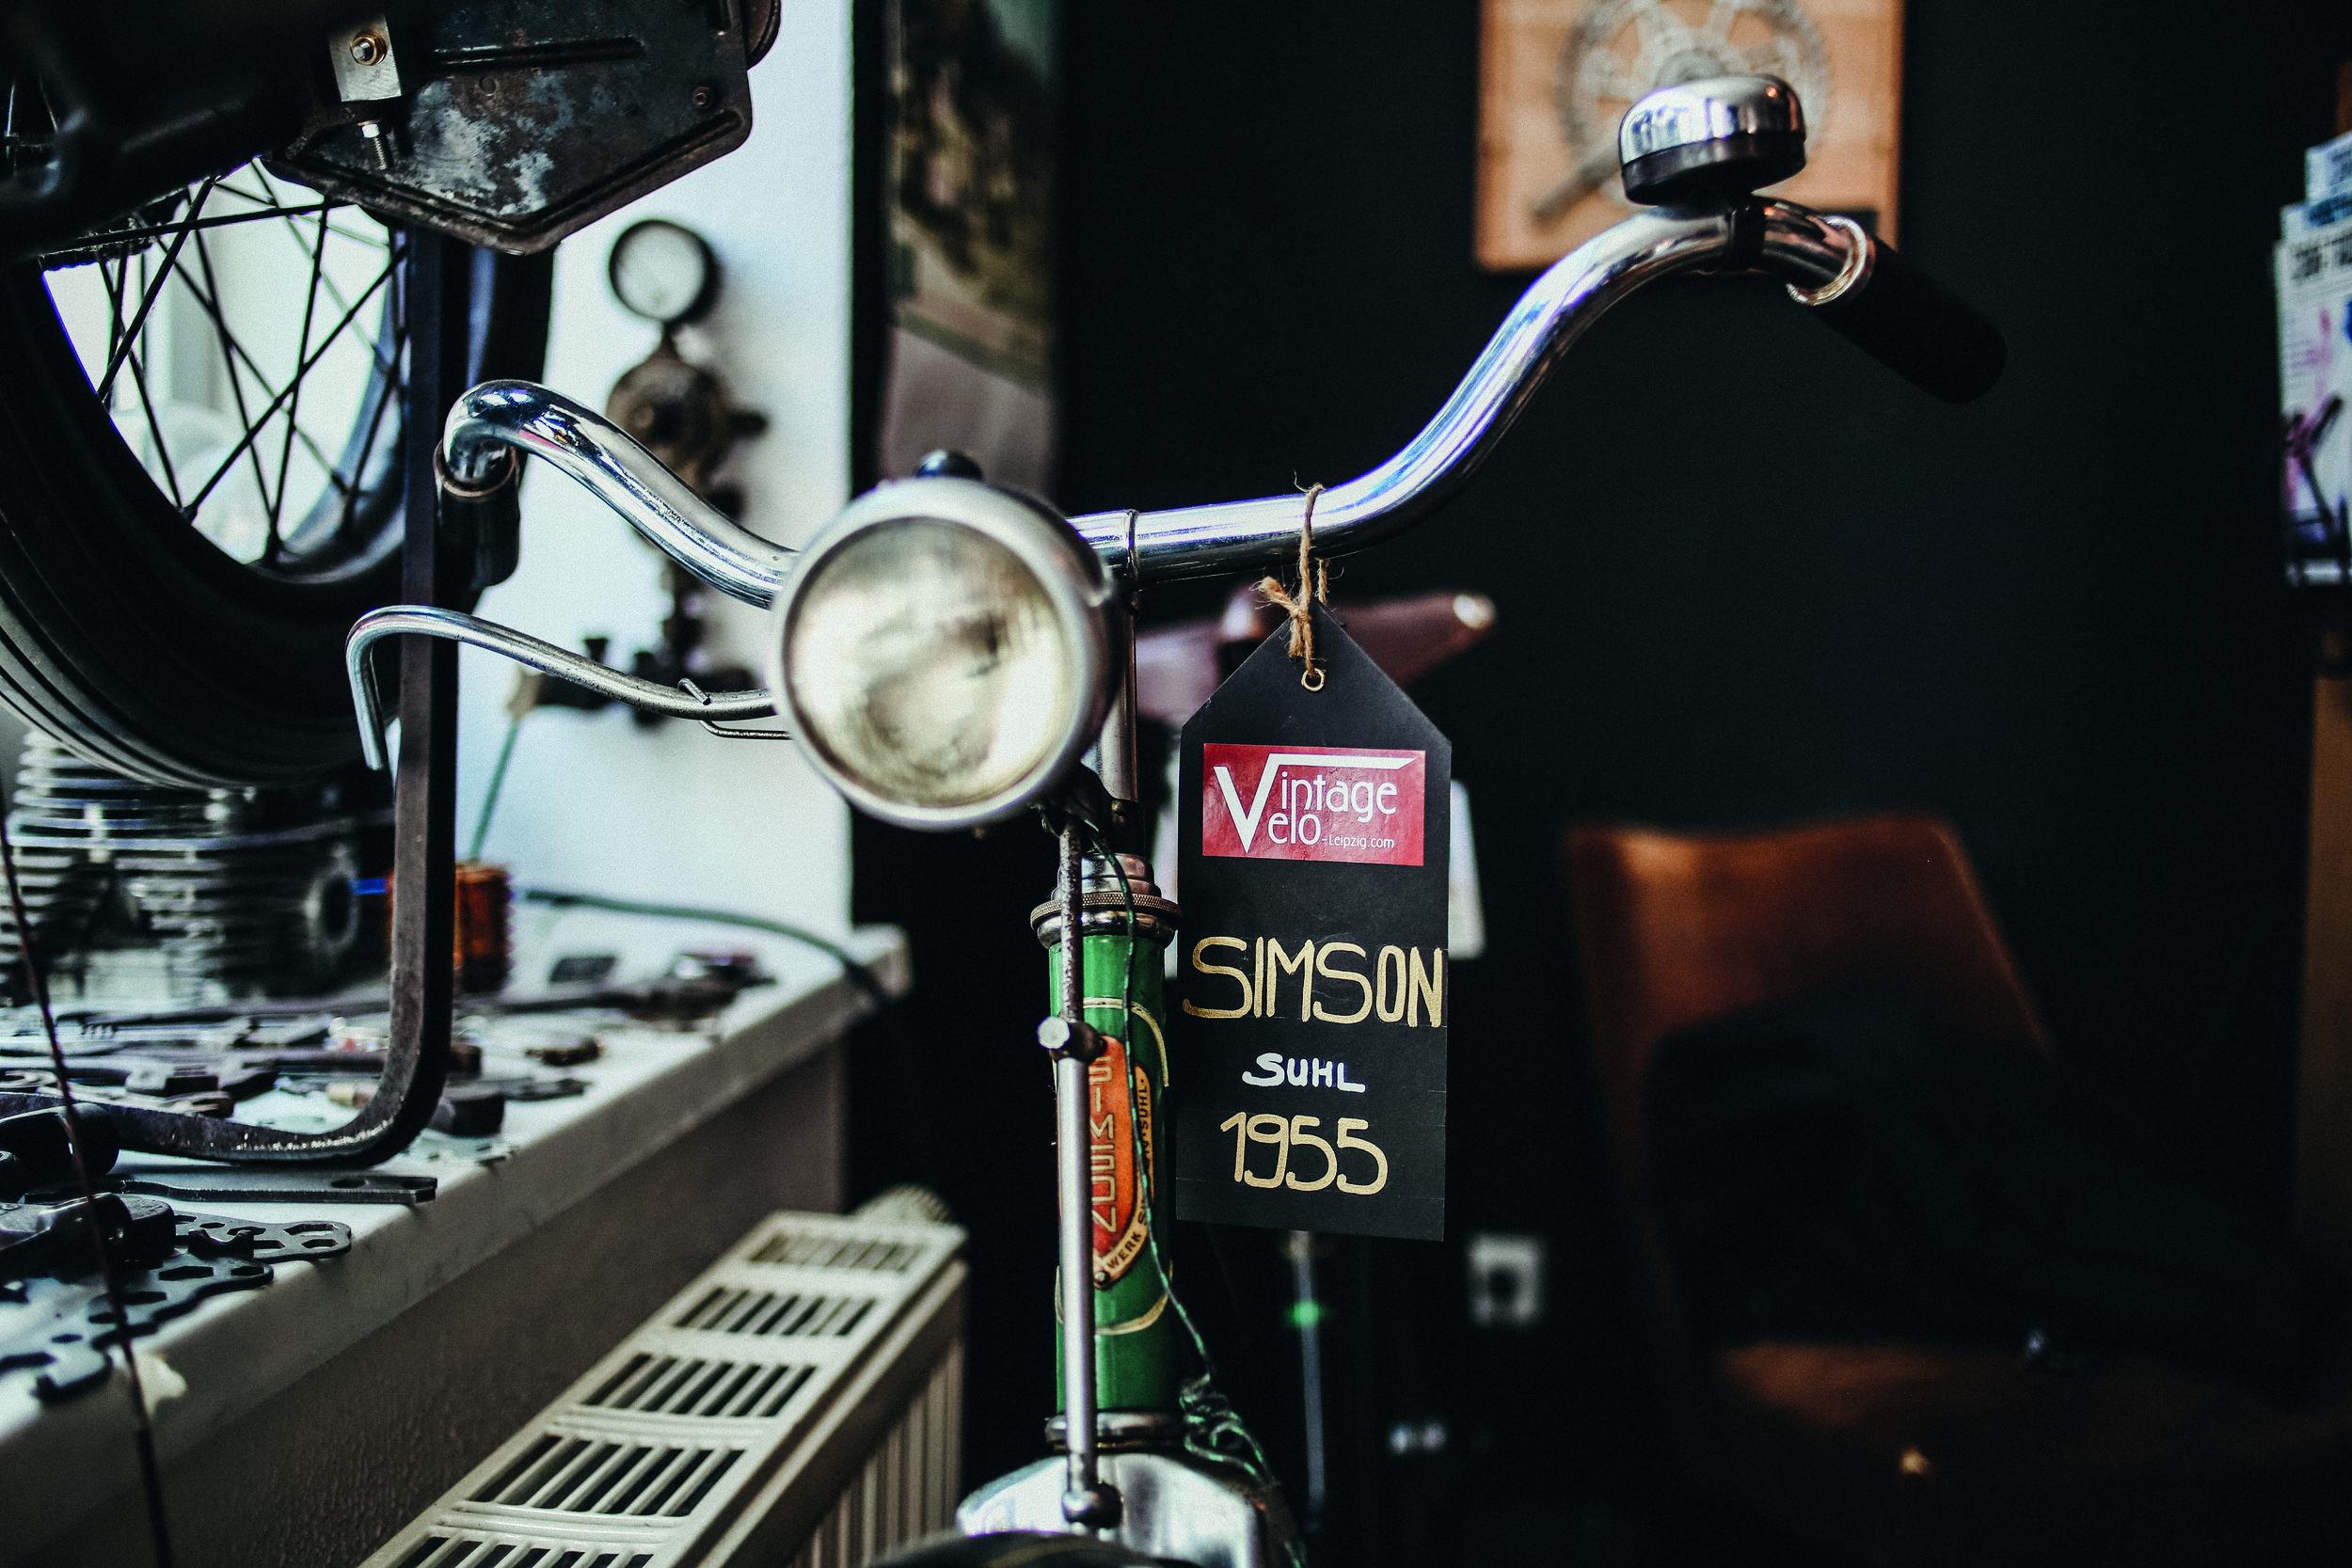 we ride leipzig-magazin-fahrradkultur-vintage velo0.jpg